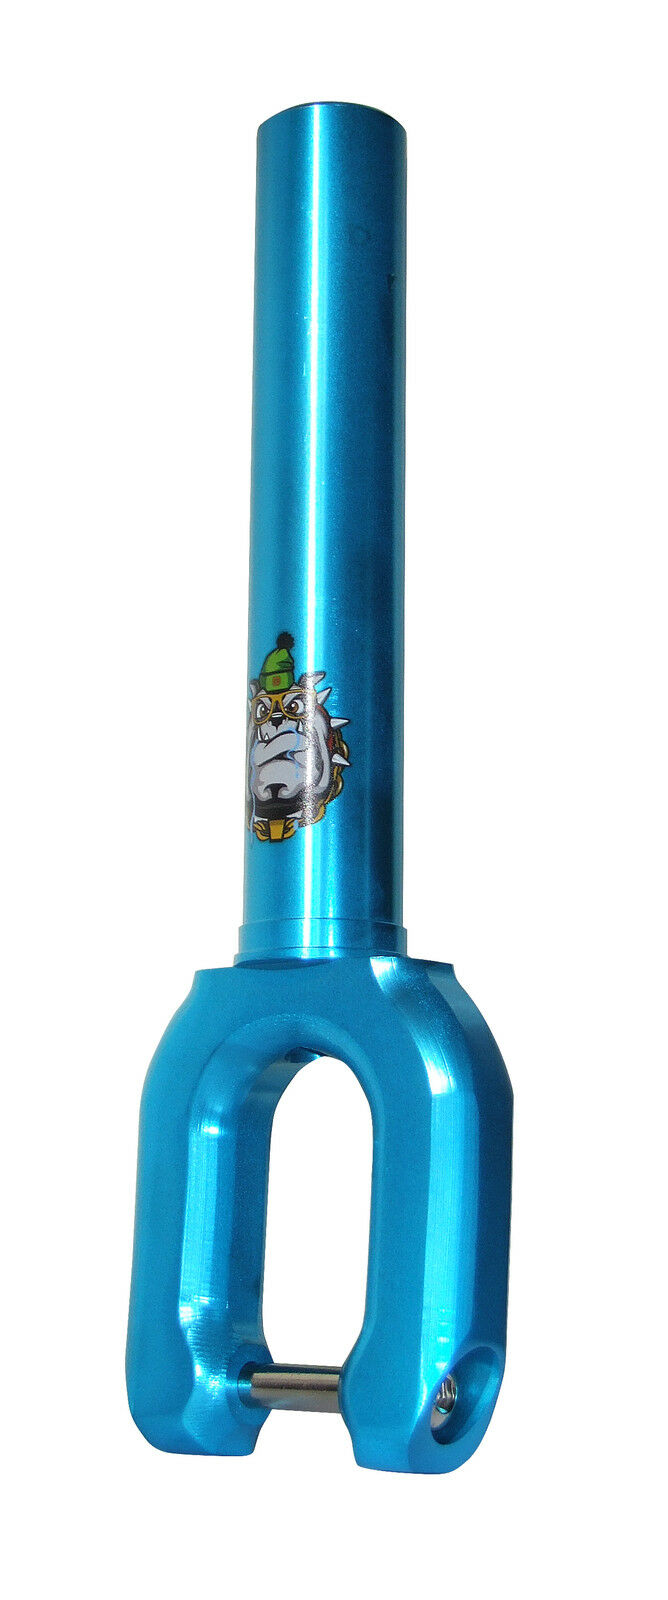 TEAM DOGZ THREADLESS blueE FAT FORKS 4 STUNT PRO SCOOTER FITS 100MM 110MM WHEELS